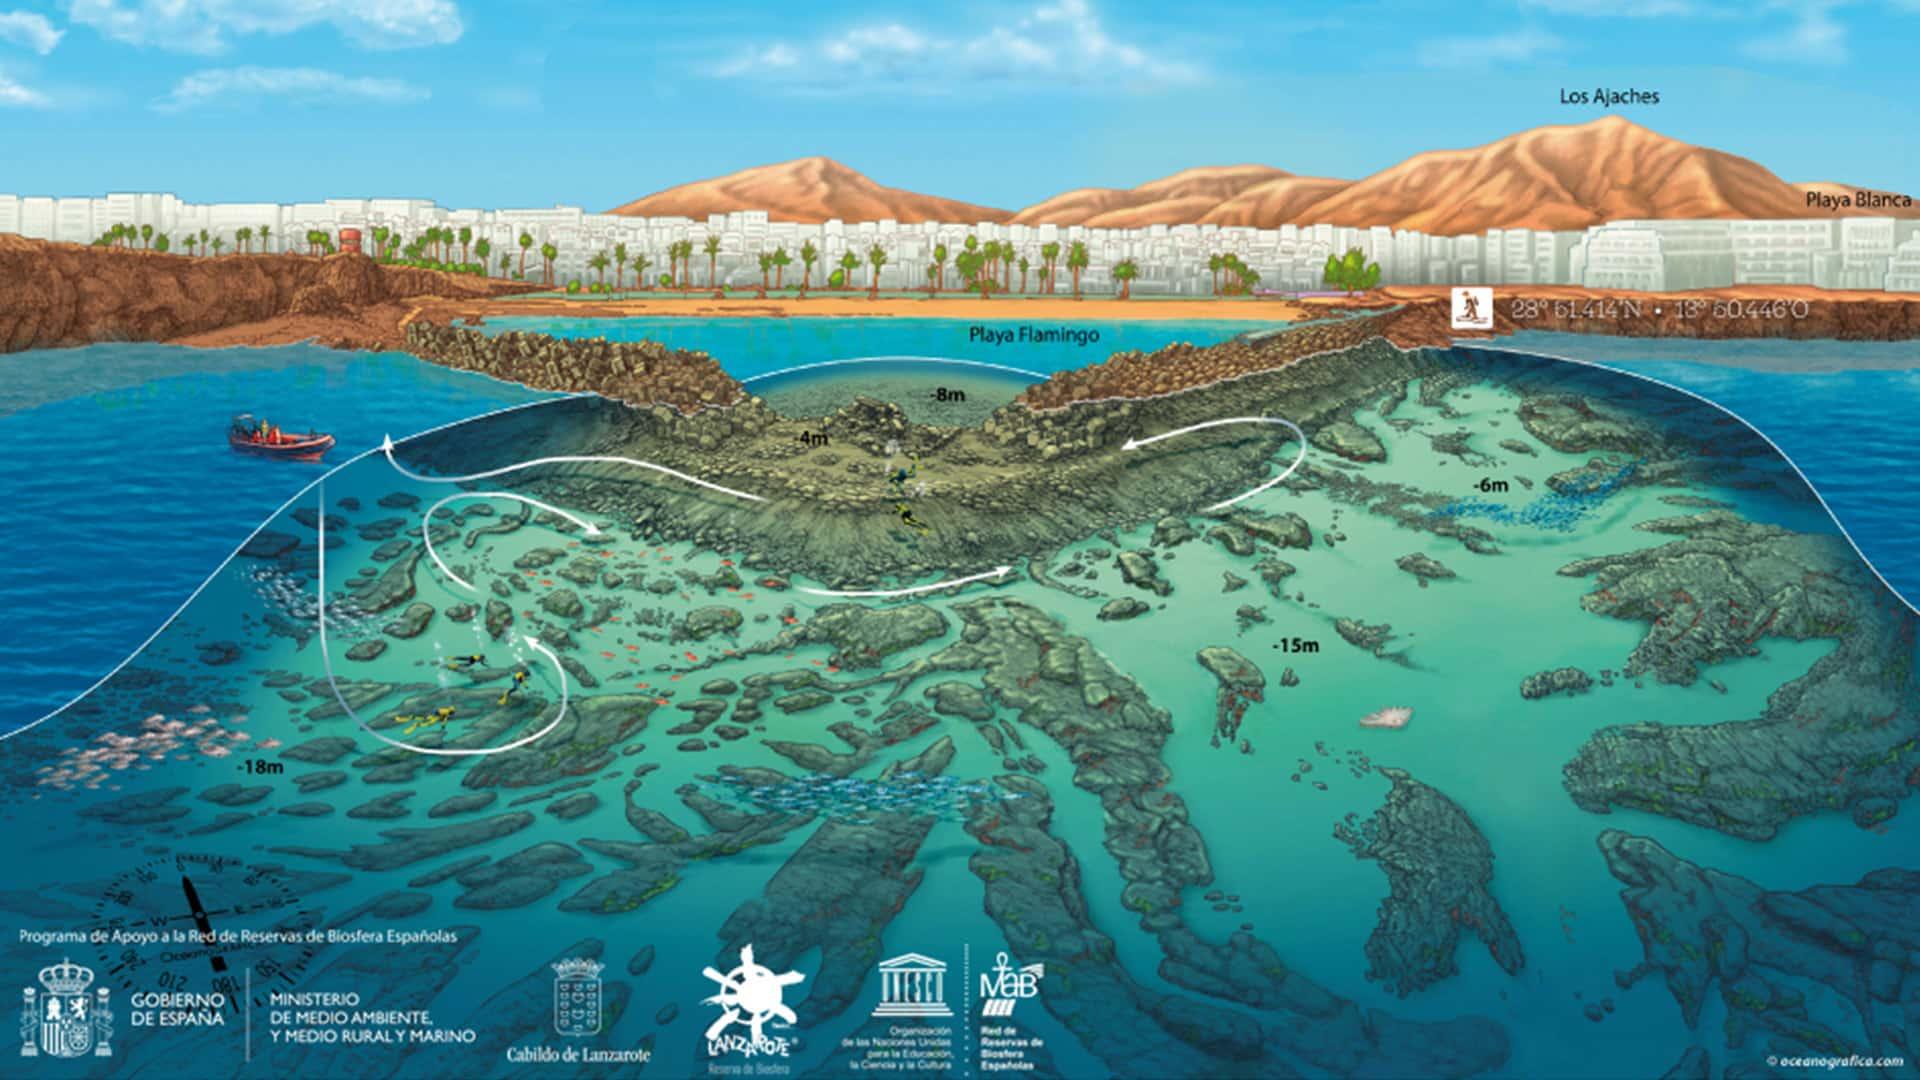 mojo dive ocean divers playa flamingo mapa lanzarote